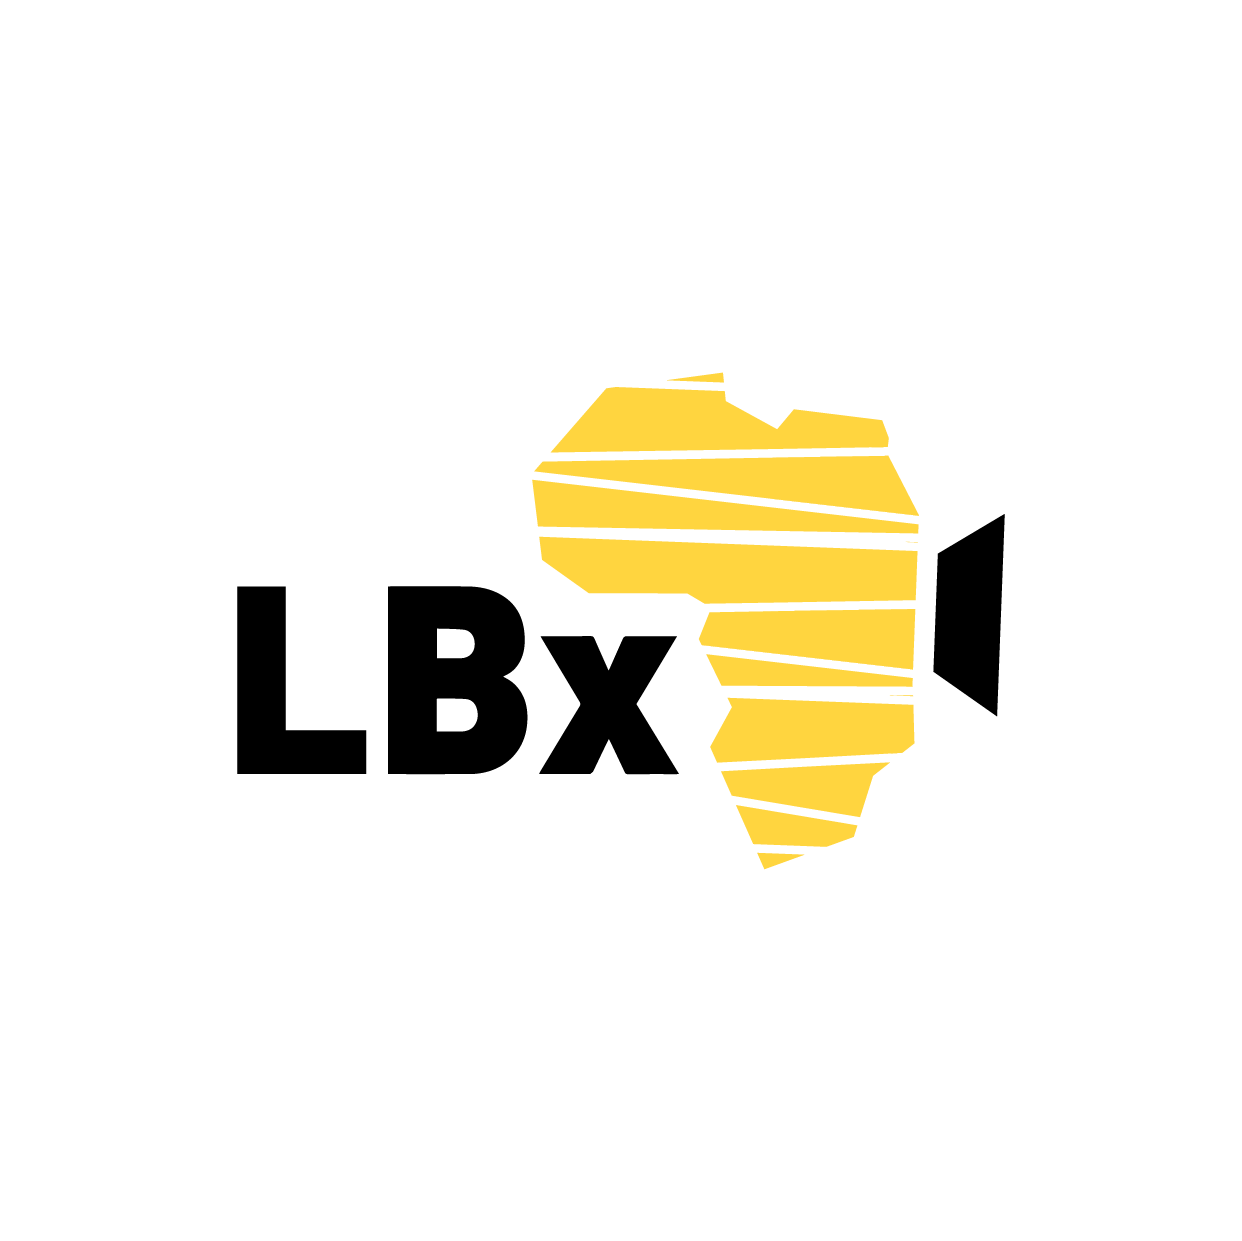 LBxAfrica